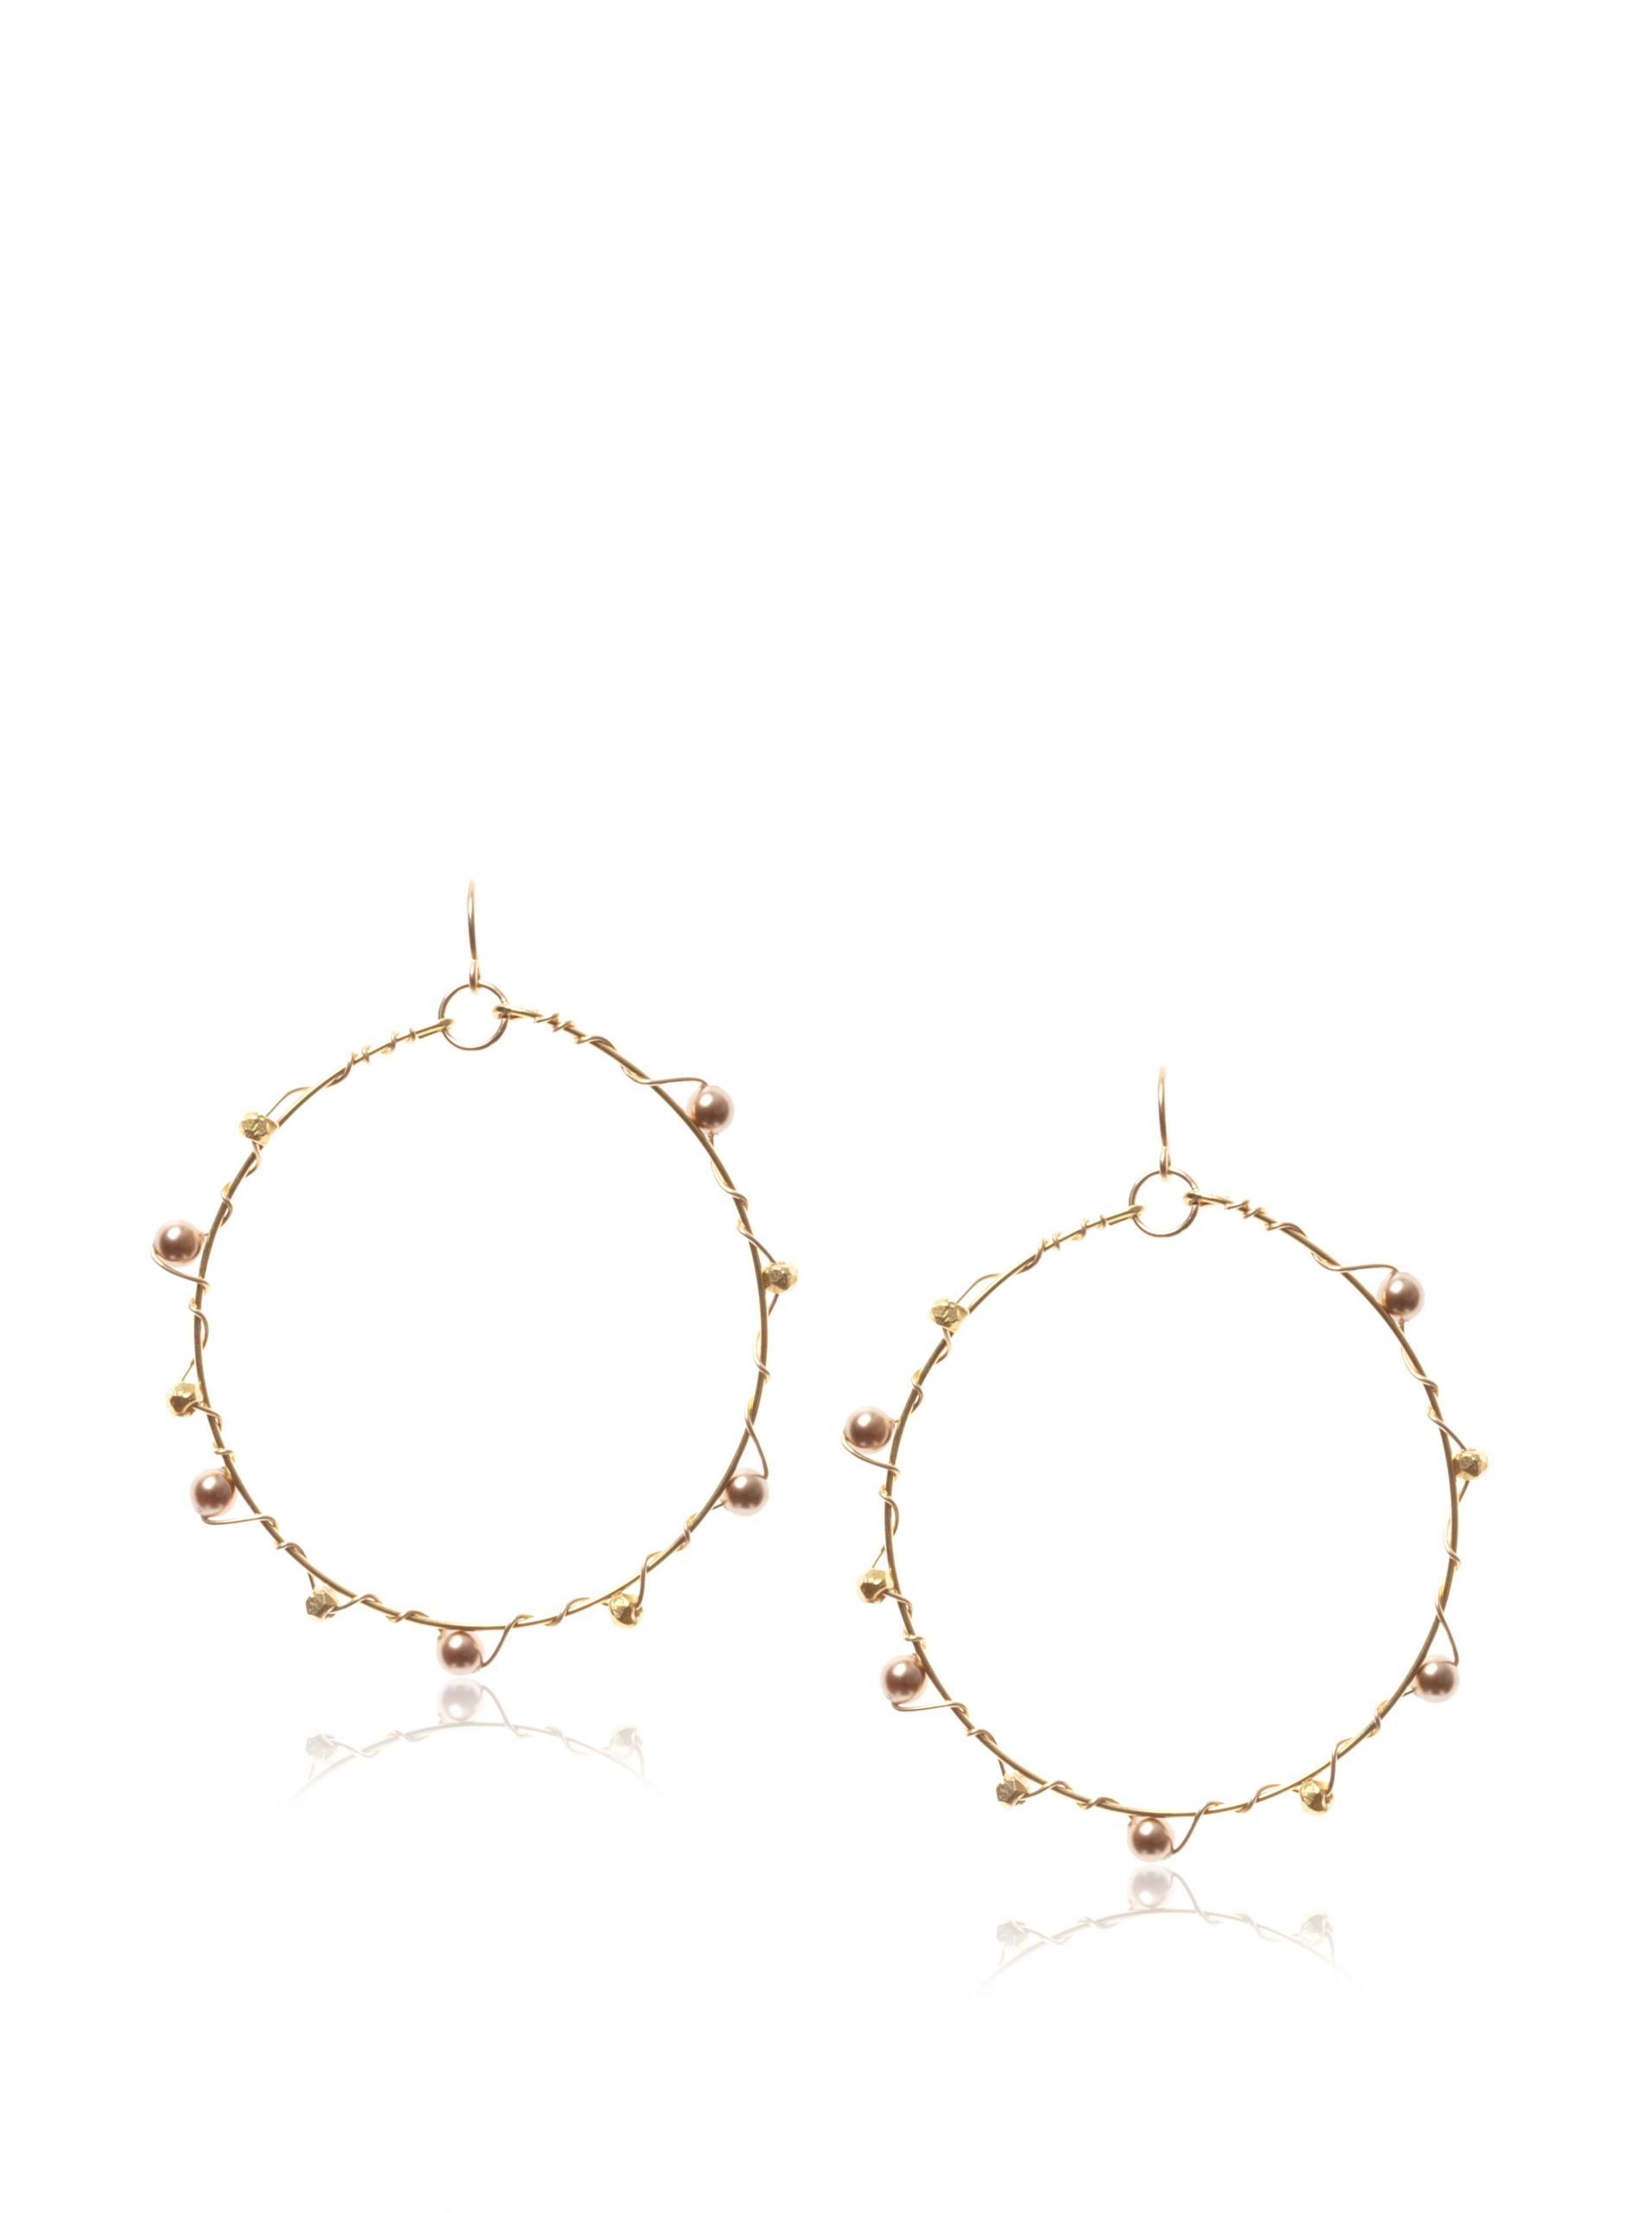 gorjana Bouquet Hoop Earrings , Bronze and Gold